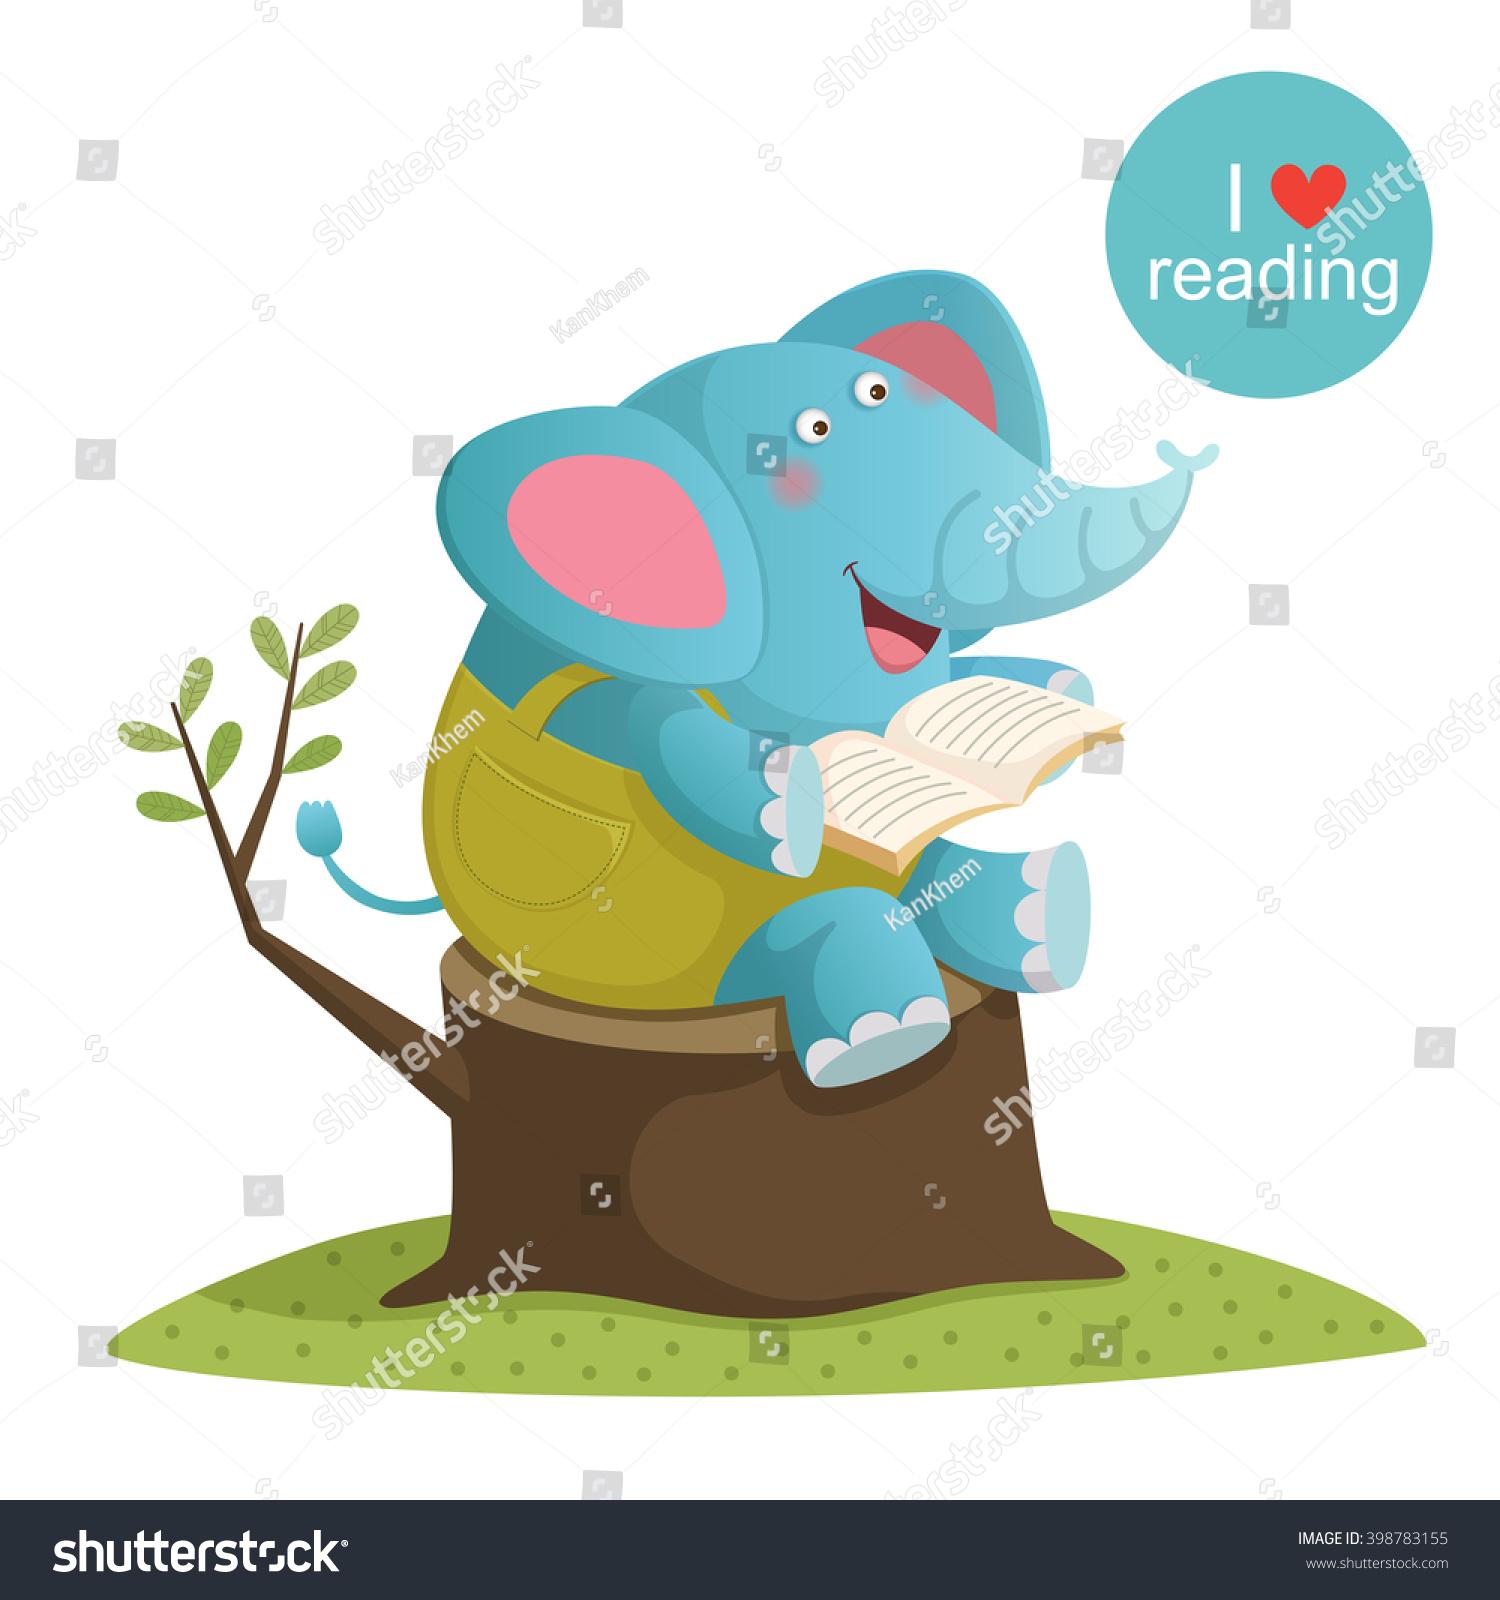 Worksheet Elephant Reading vector illustration cartoon elephant reading book stock of a book